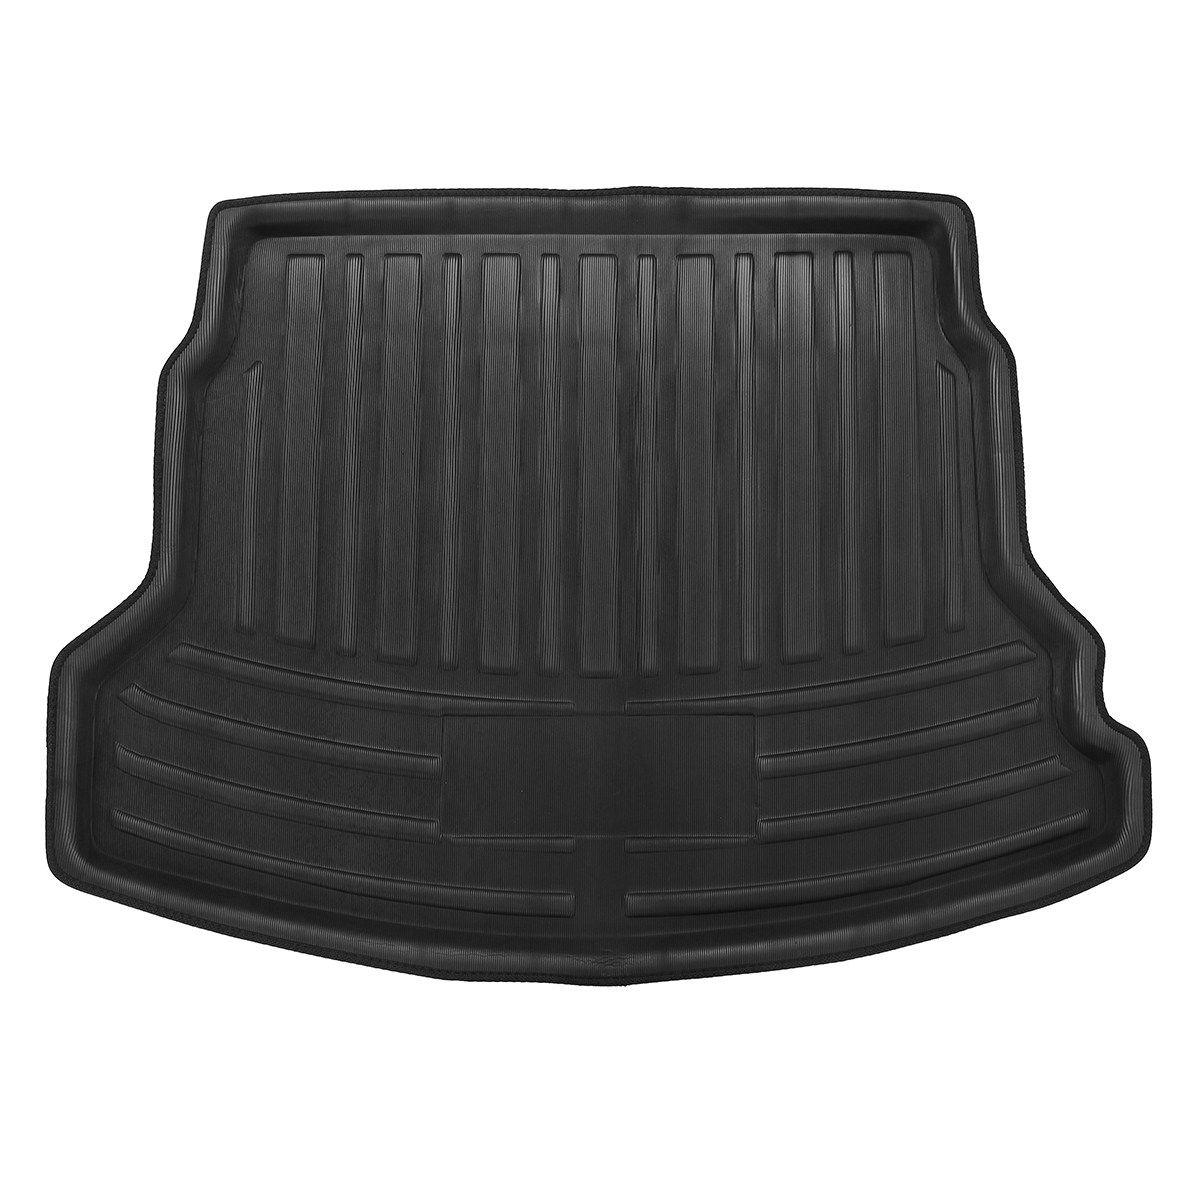 Black Car Rear Trunk Liner Cargo Boot Mat Floor Tray Protector Blanket For Honda CRV for CRV 2012-2016 Up